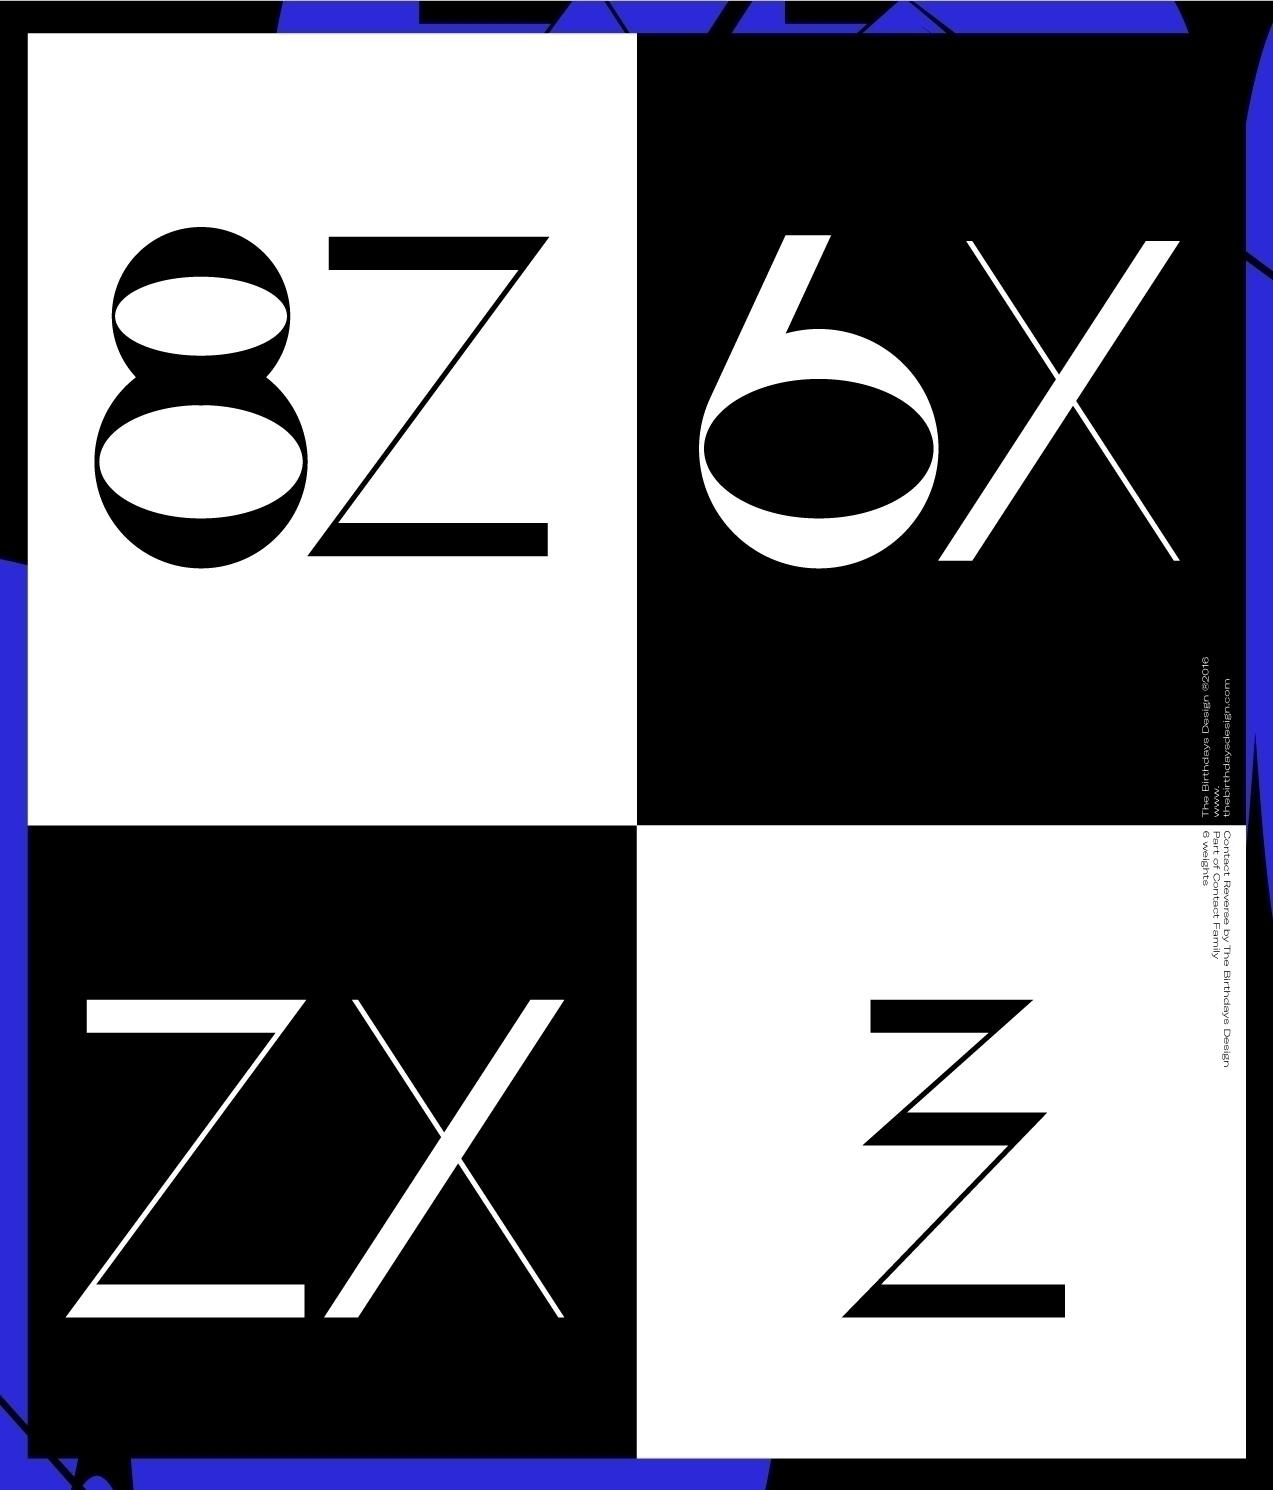 8Z-6X-ZX-Ξ. CMNG-SN. The Birthd - strouzas   ello